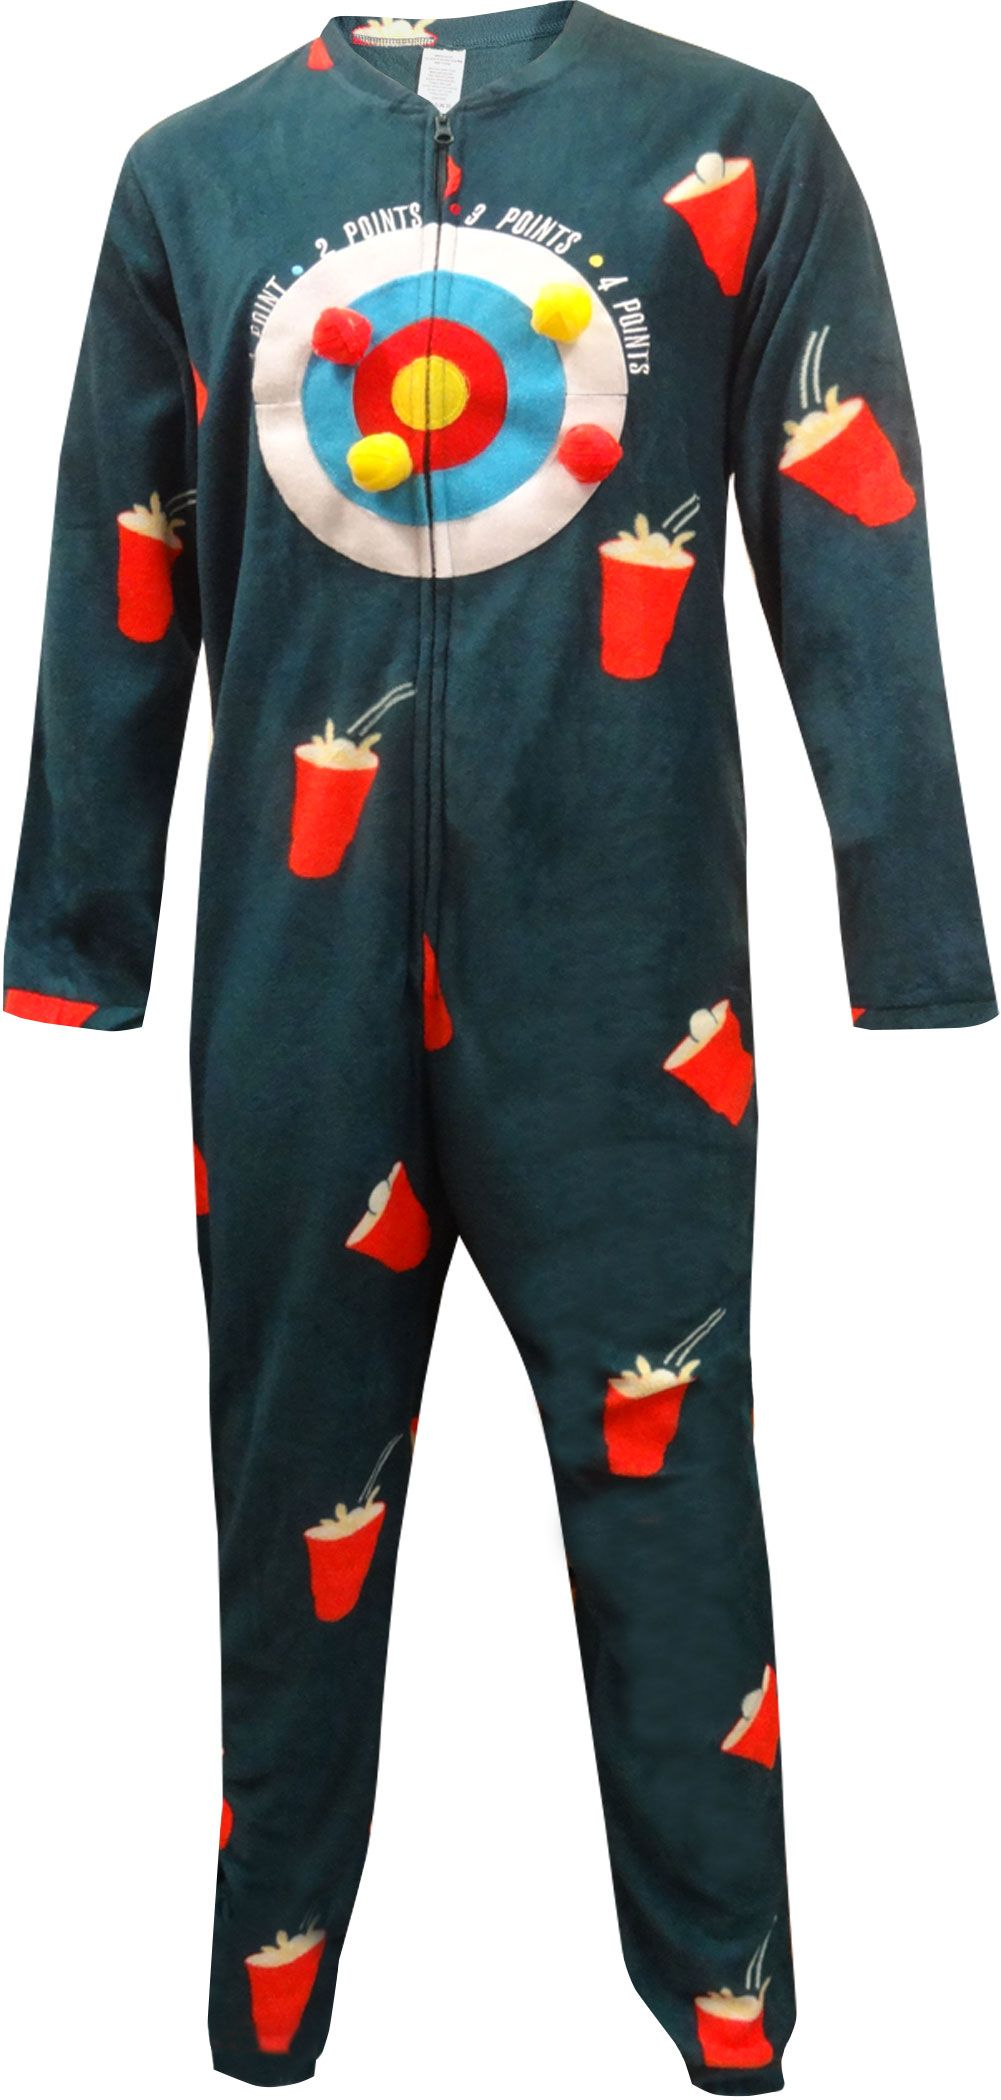 WebUndies.com Human Dart Board One Piece Union Suit Pajama 611f82f09